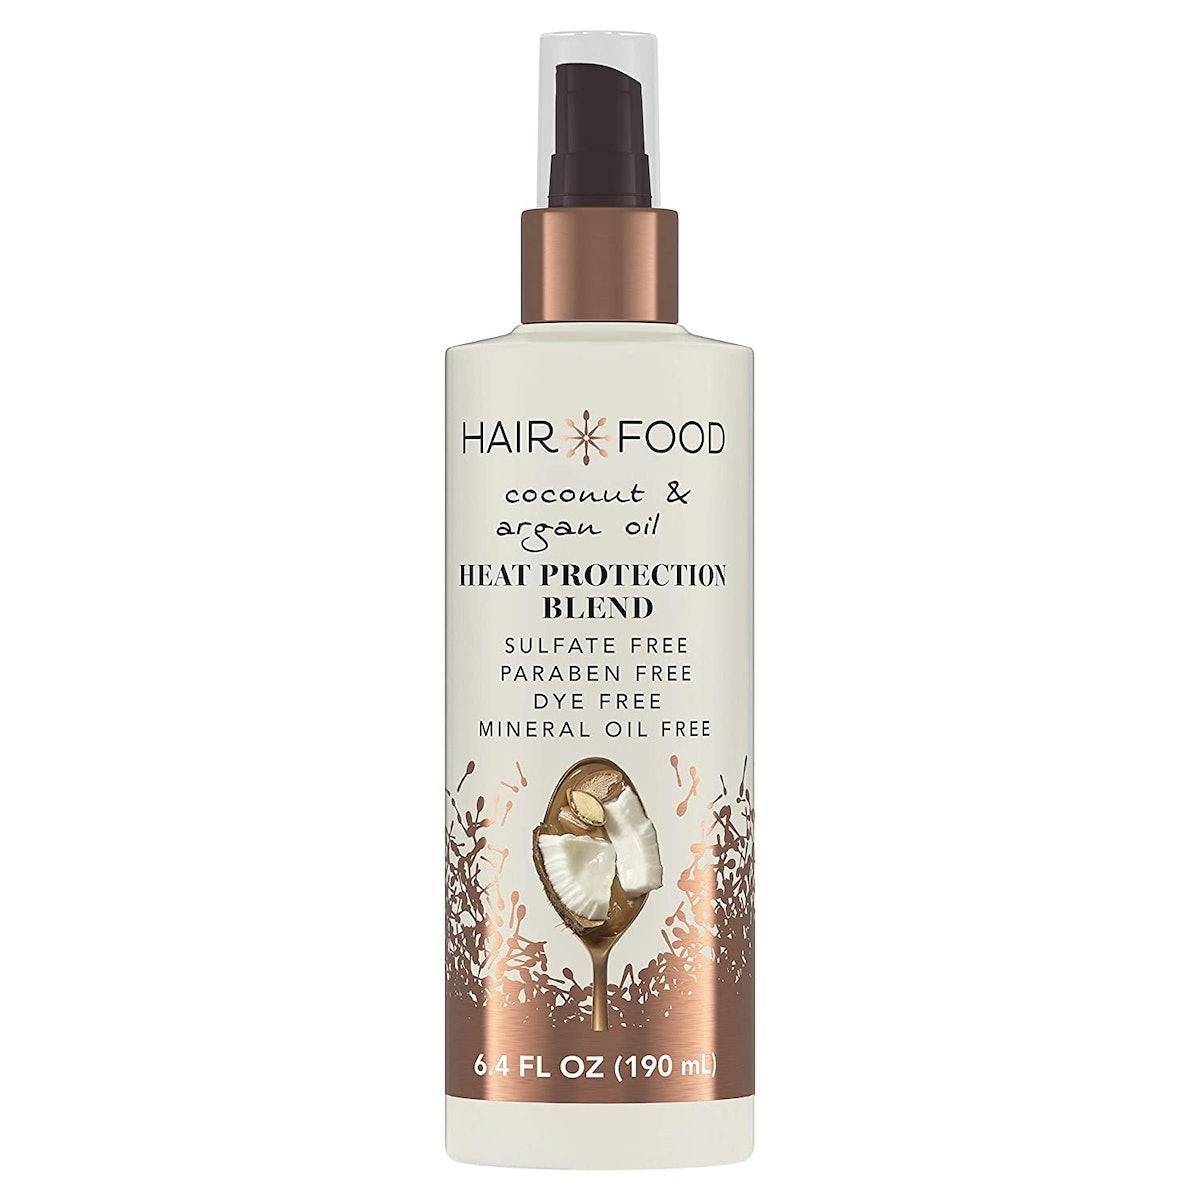 Hair Food Coconut & Argan Oil Heat Protection Blend